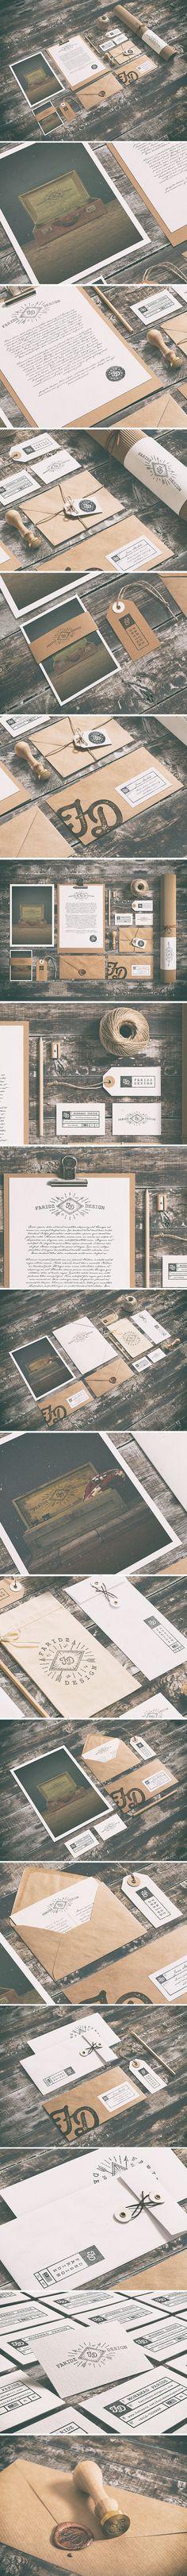 New Self ReBranding By Faridz Design Suite | #stationary